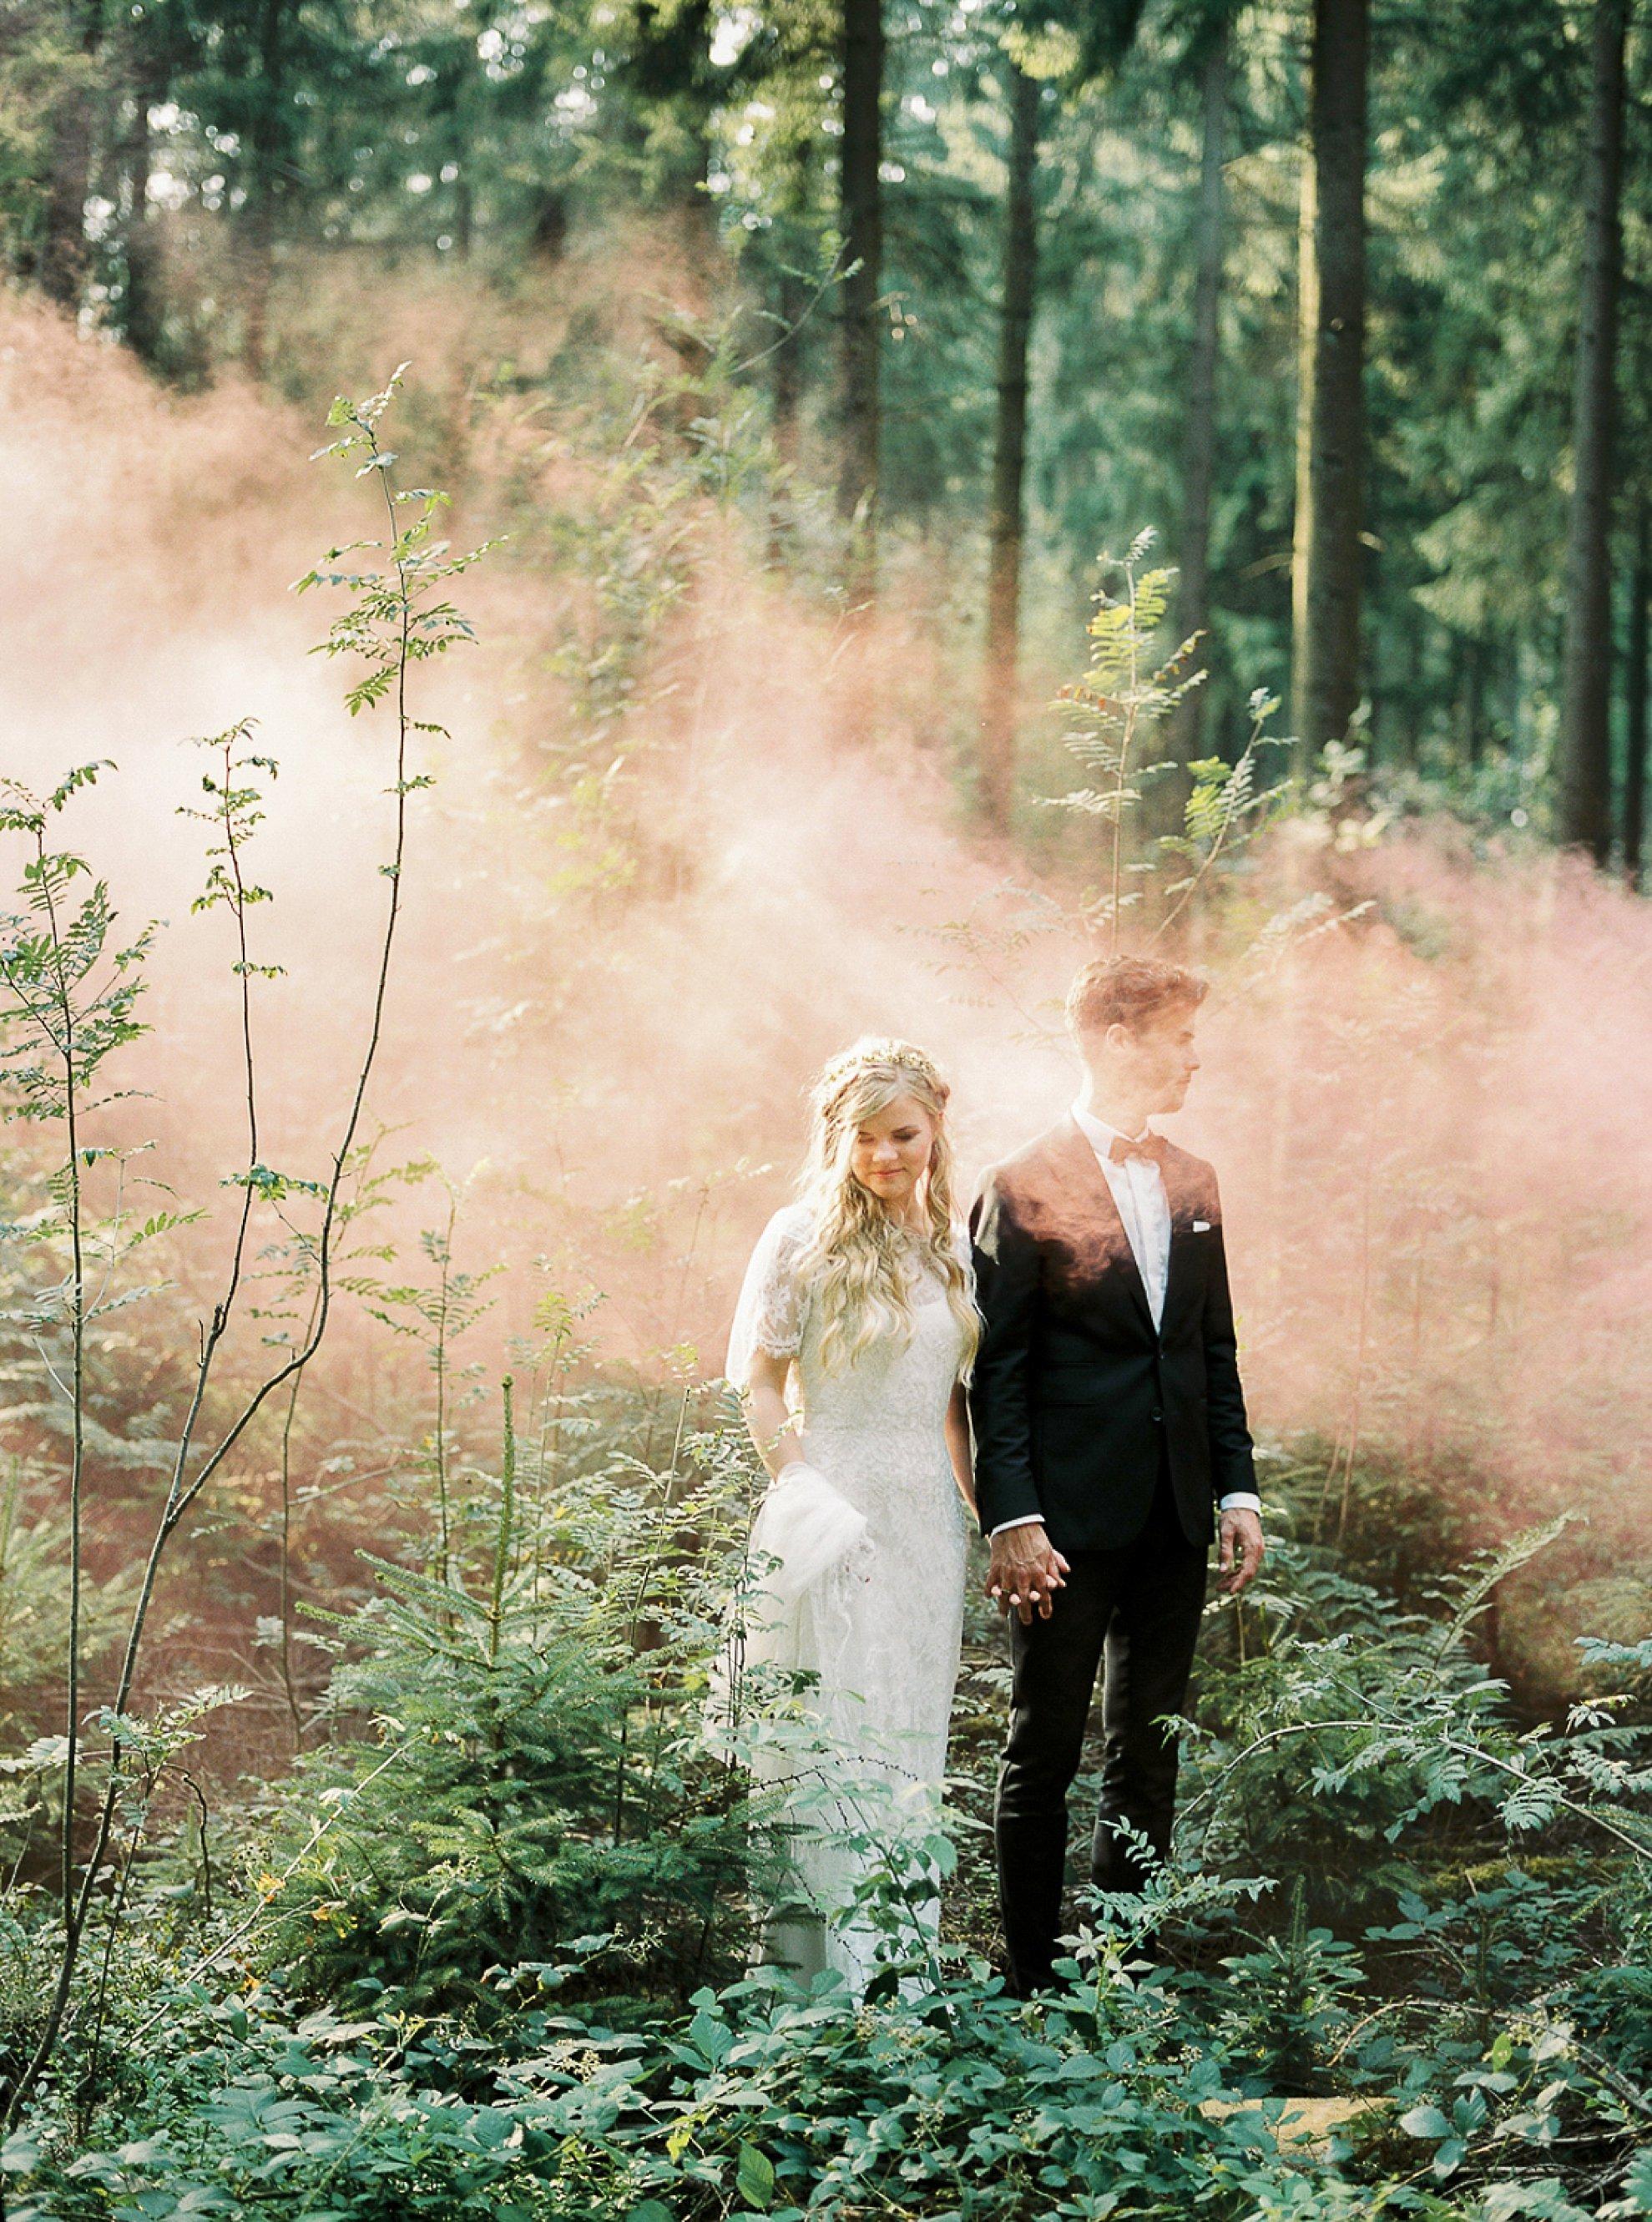 Amanda-Drost-Fotografie-Belgie-Photography-Wedding_0001.jpg